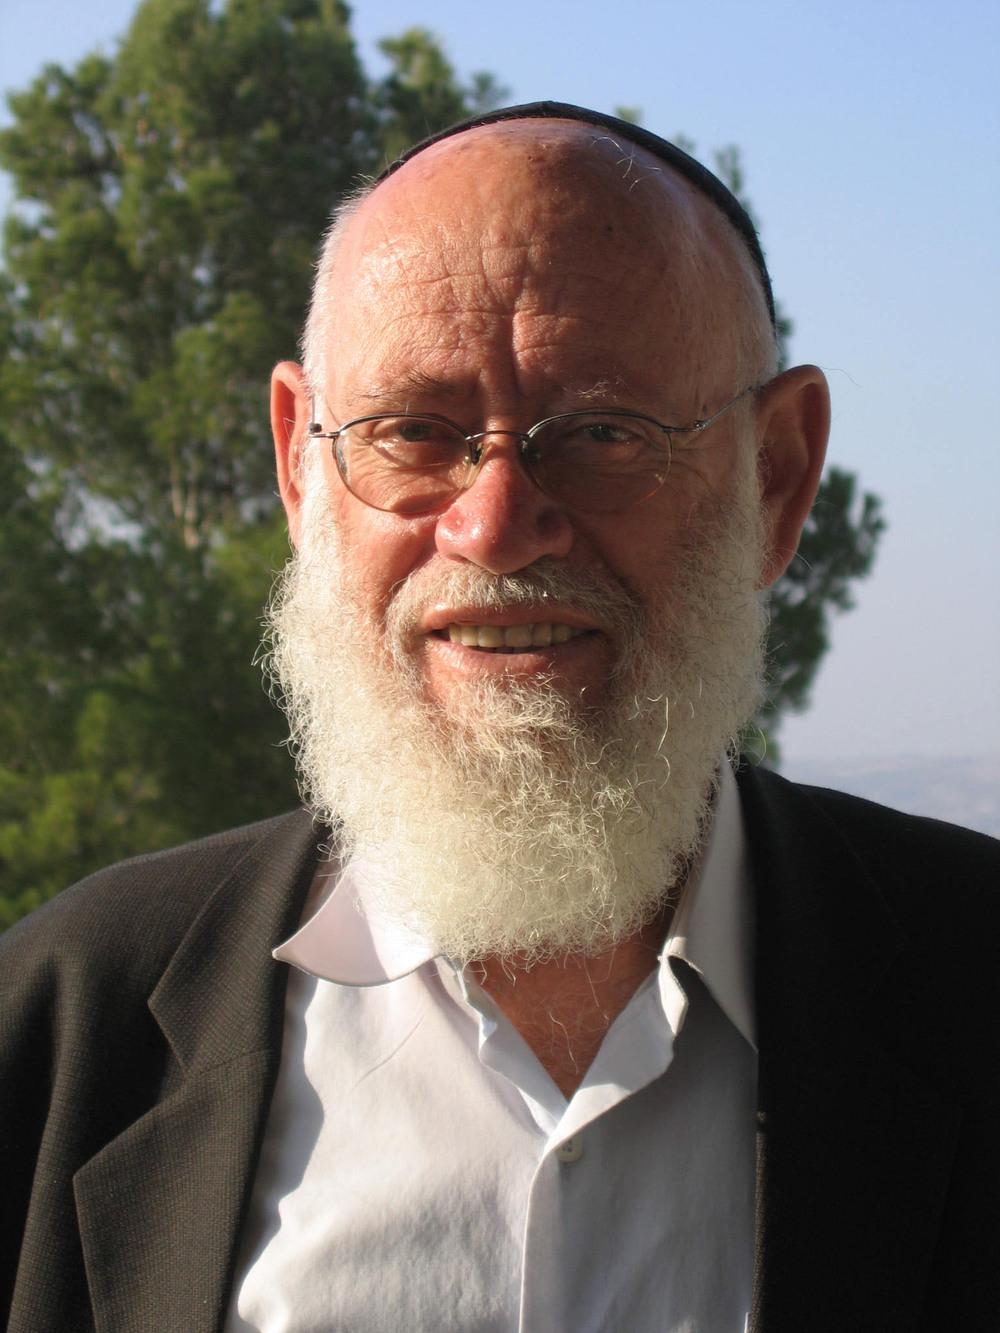 Rabbi Moshe Levinger. Credit: Wikimedia Commons.